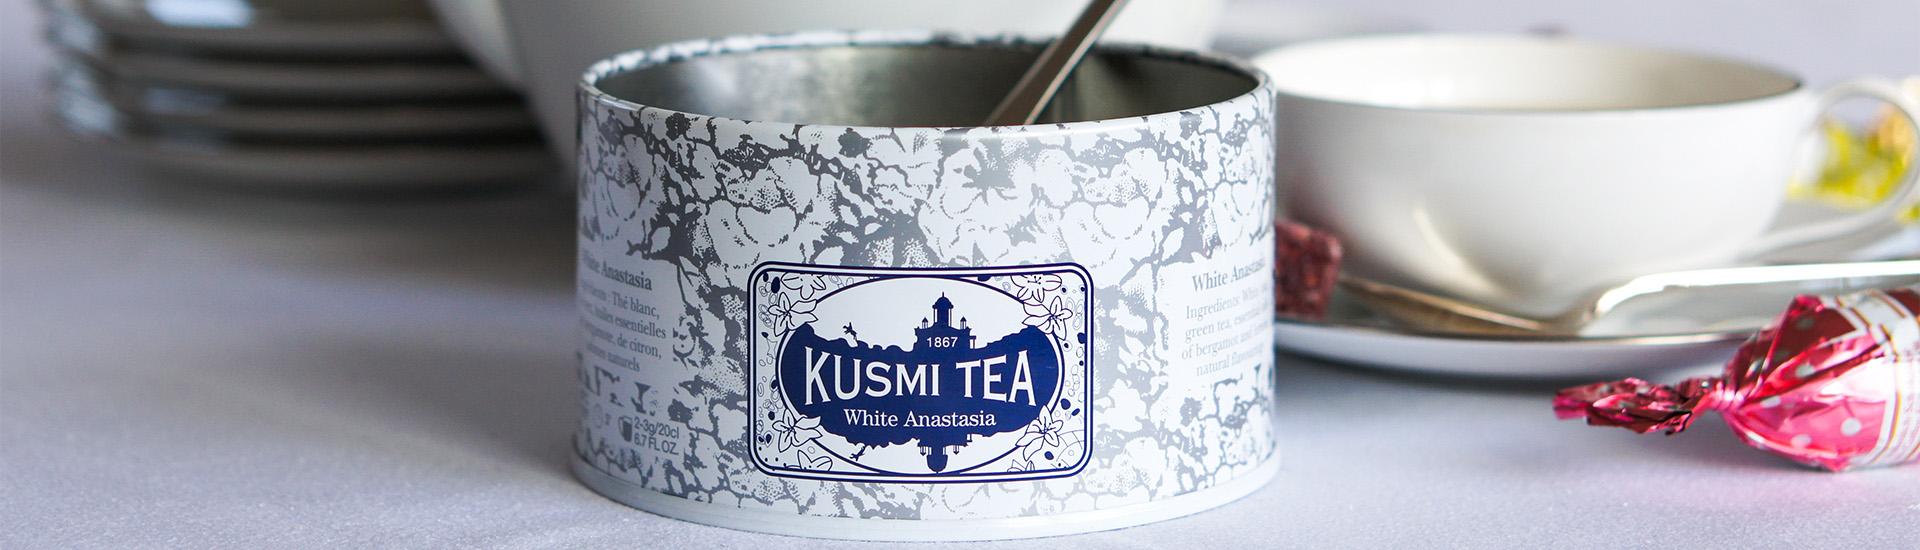 Новый любимый чай Kusmi Tea White Anastasia